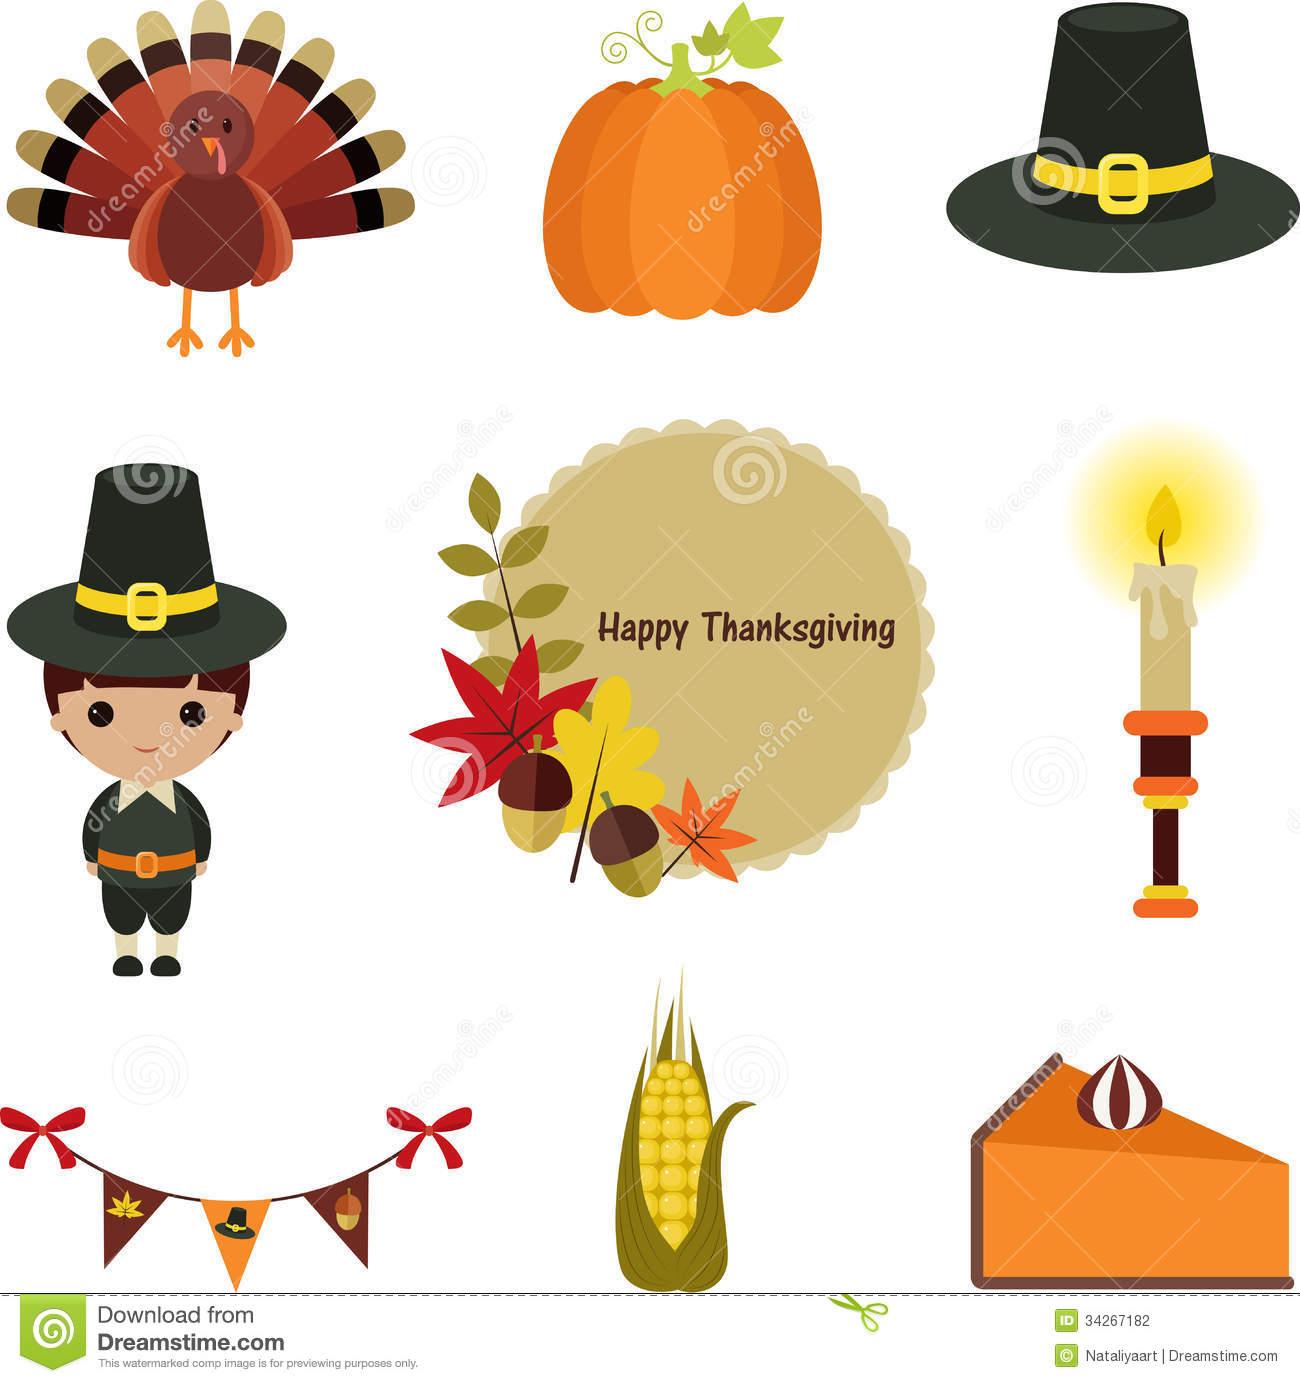 Thanksgiving clip-art set.